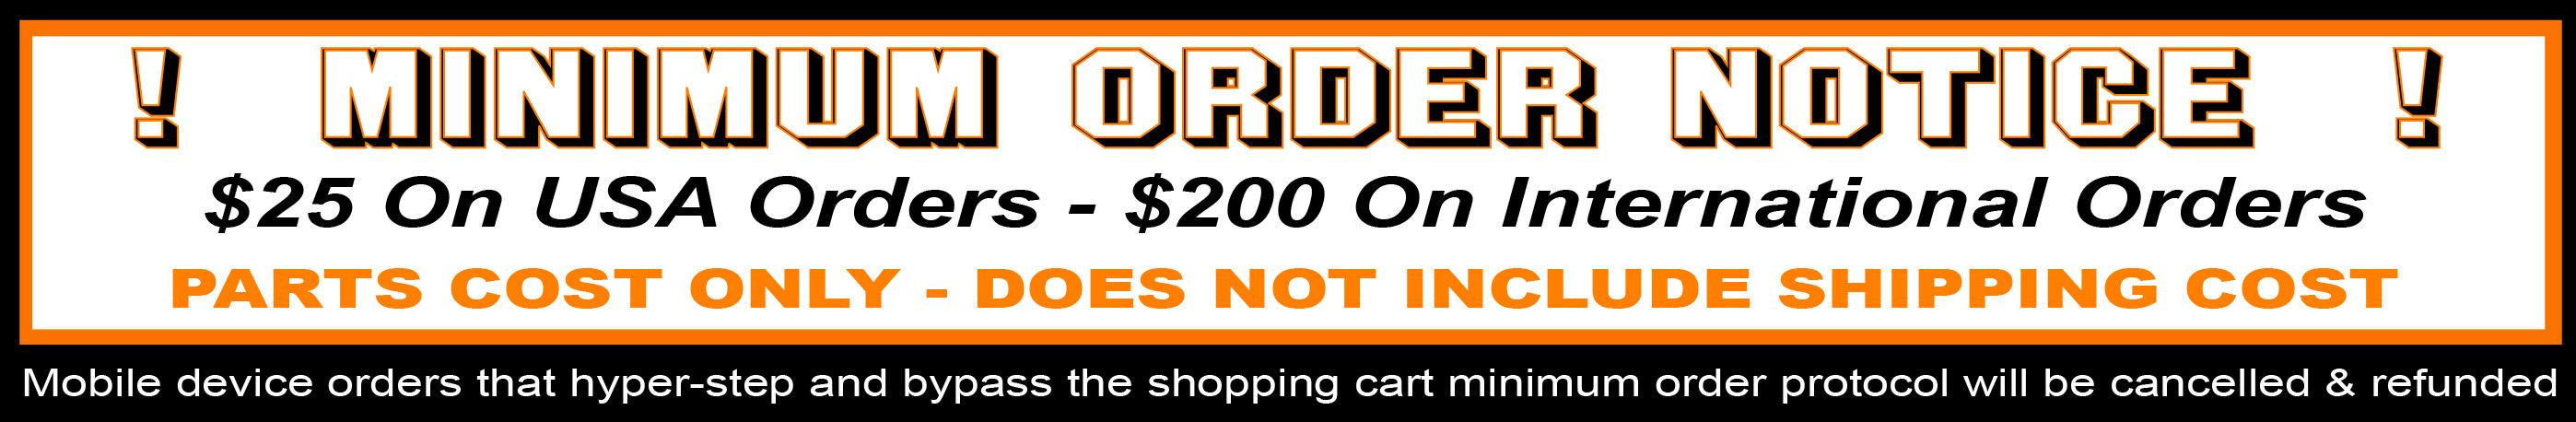 banner-minimum-order.jpg